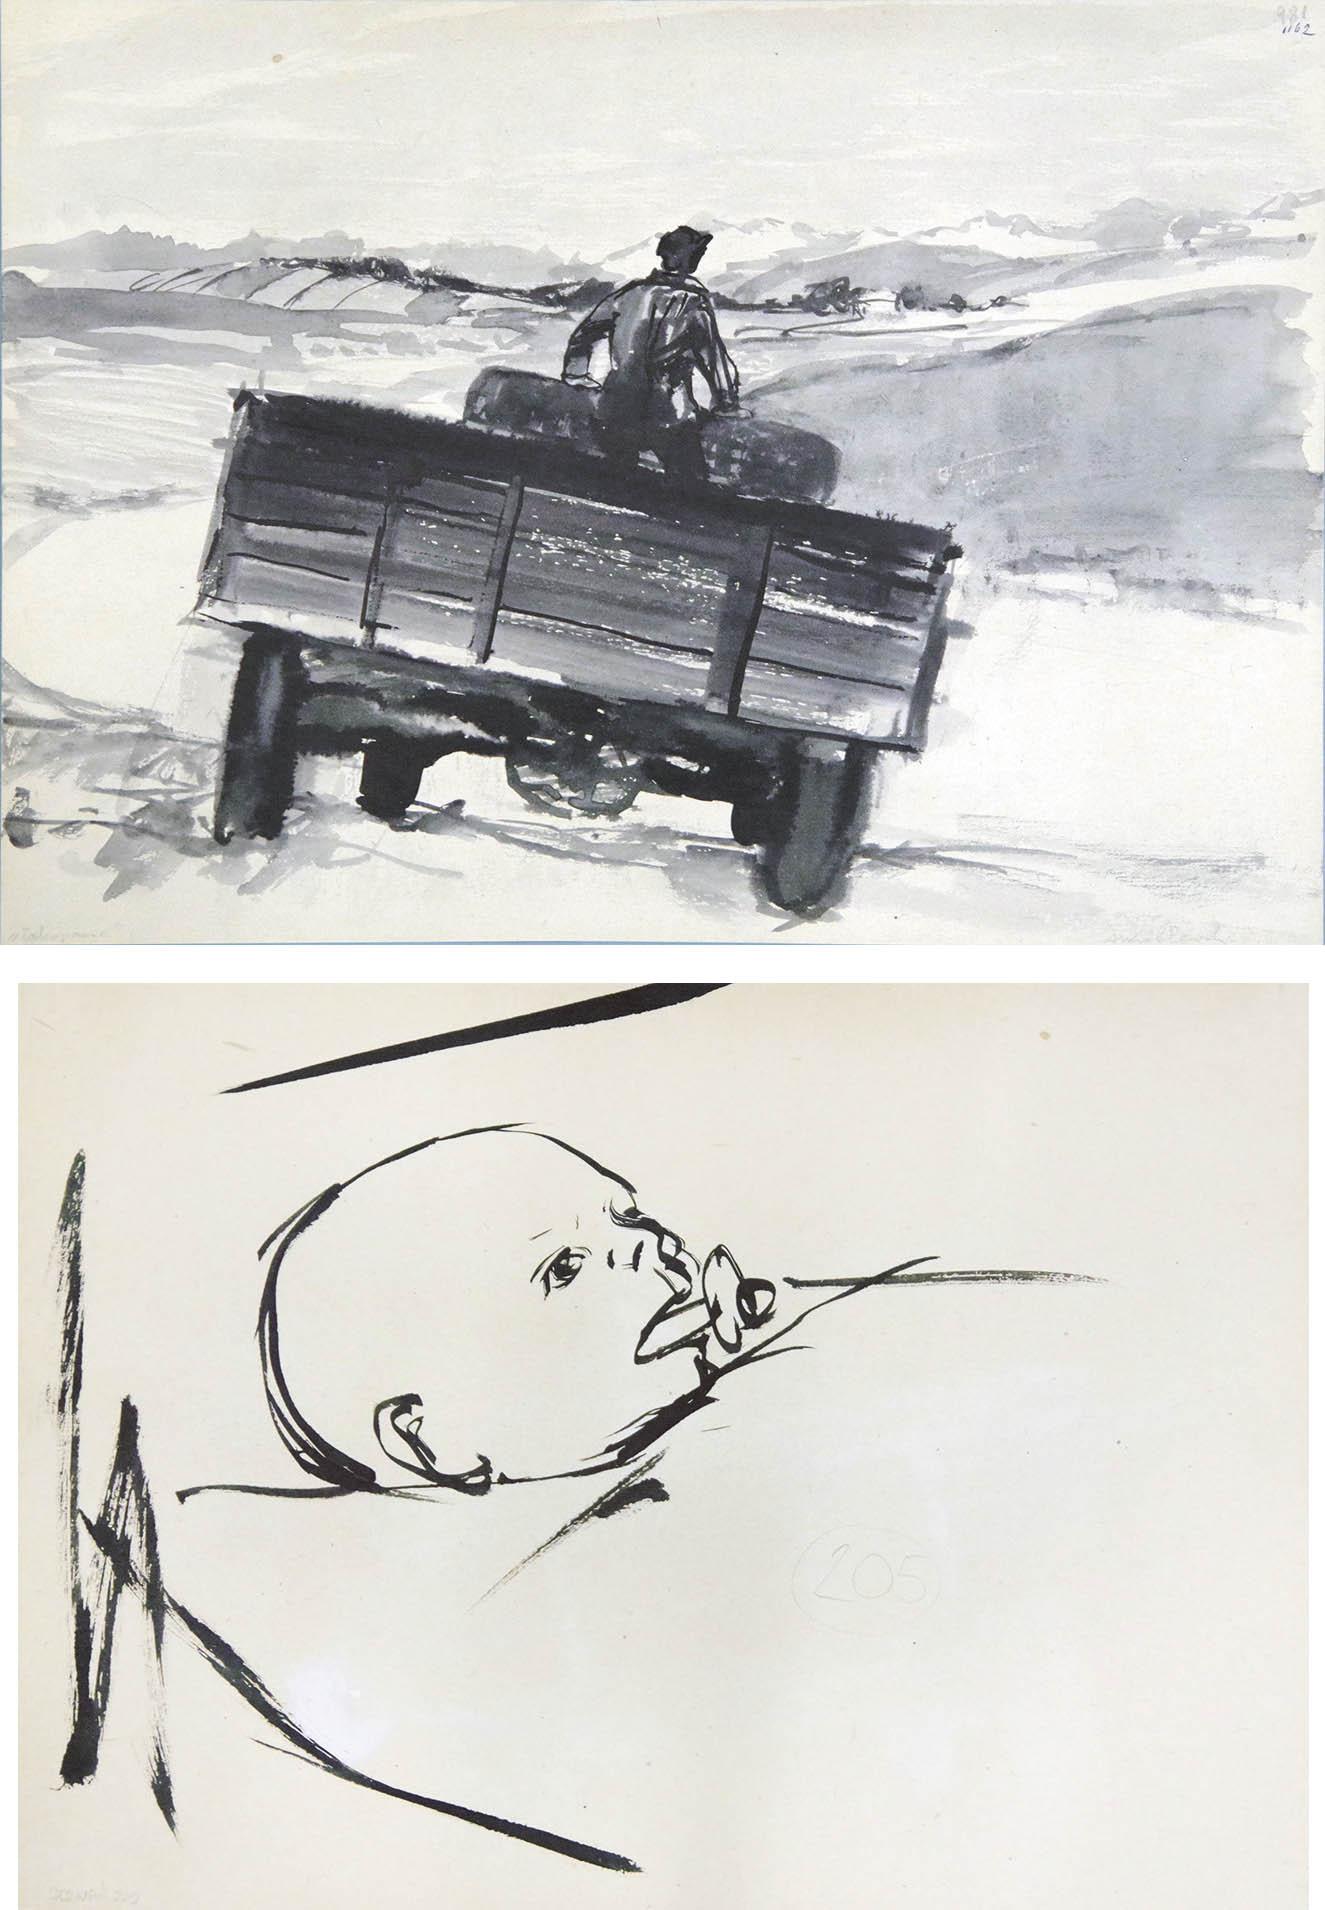 PRACA DWUSTRONNA [ZAKOPANE] NA REWERSIE [GŁÓWKA DZIECKA], OK.1954 r.